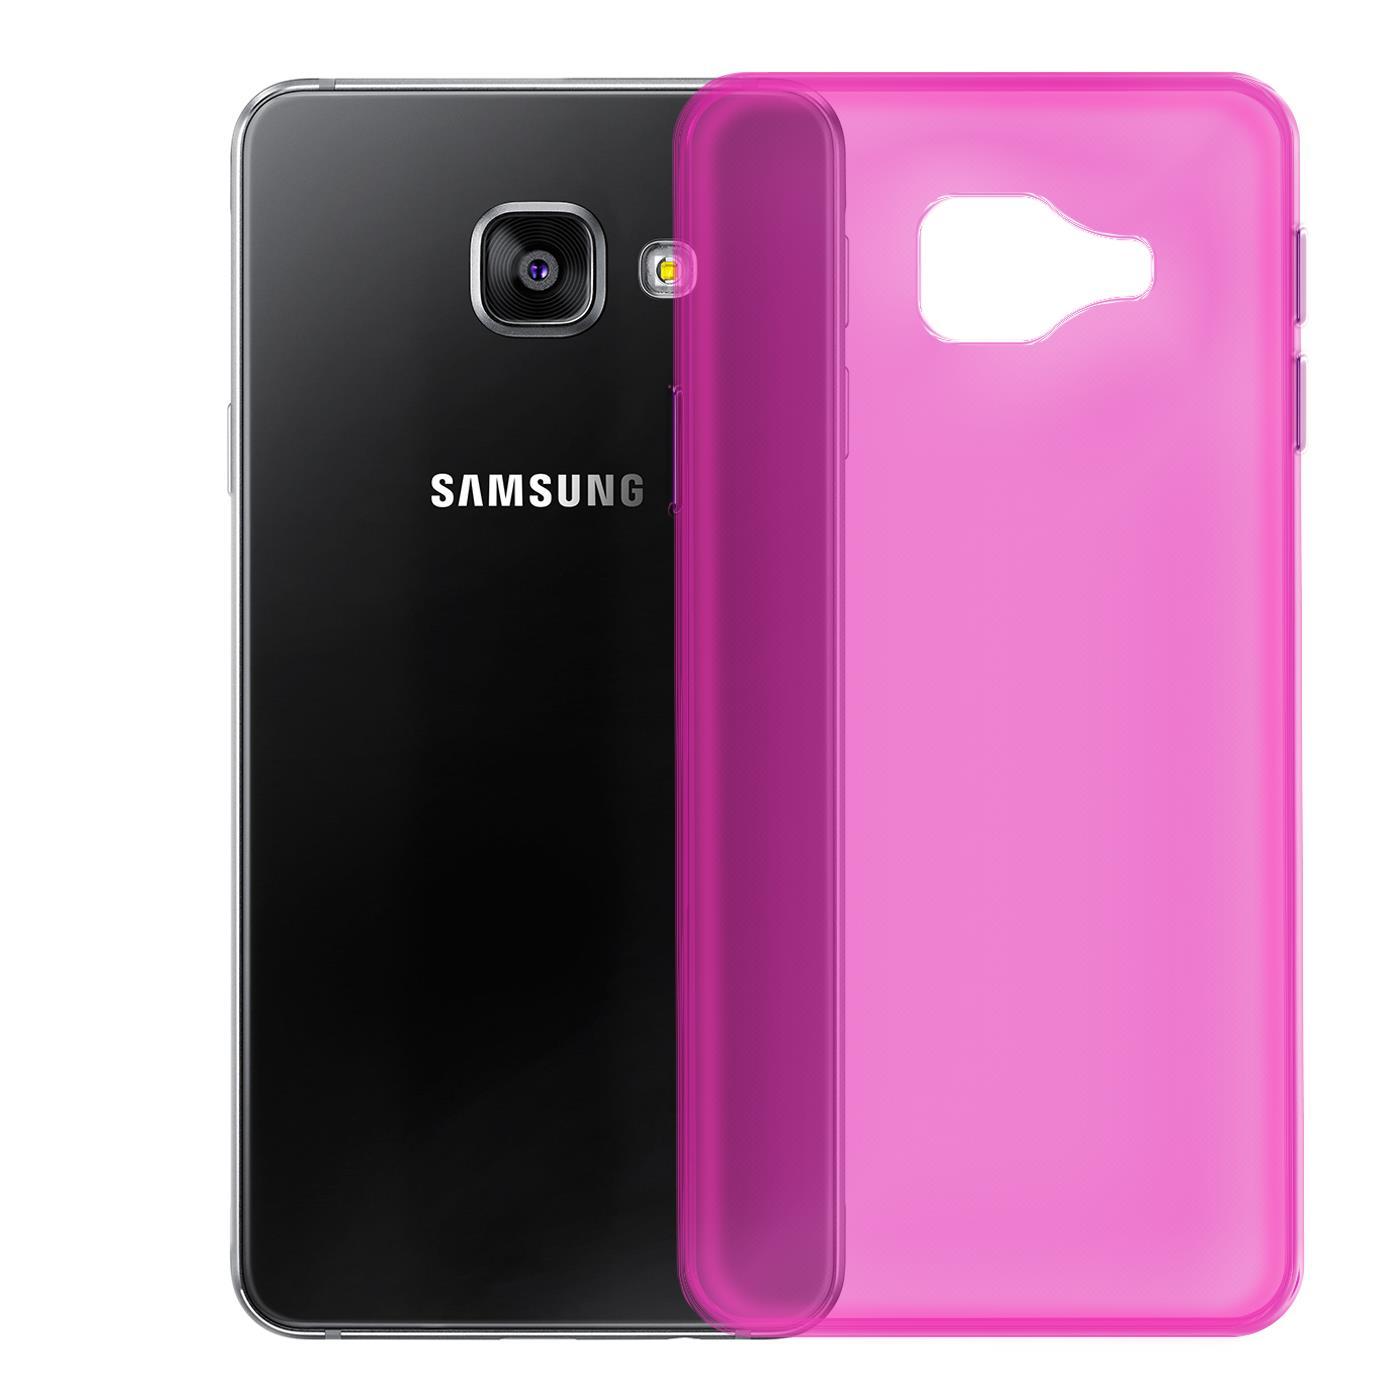 Samsung-Galaxy-a3-2016-Thin-Silikon-Klar-Case-Cover-Ultra-Slim-Stossfeste-Gel Indexbild 24